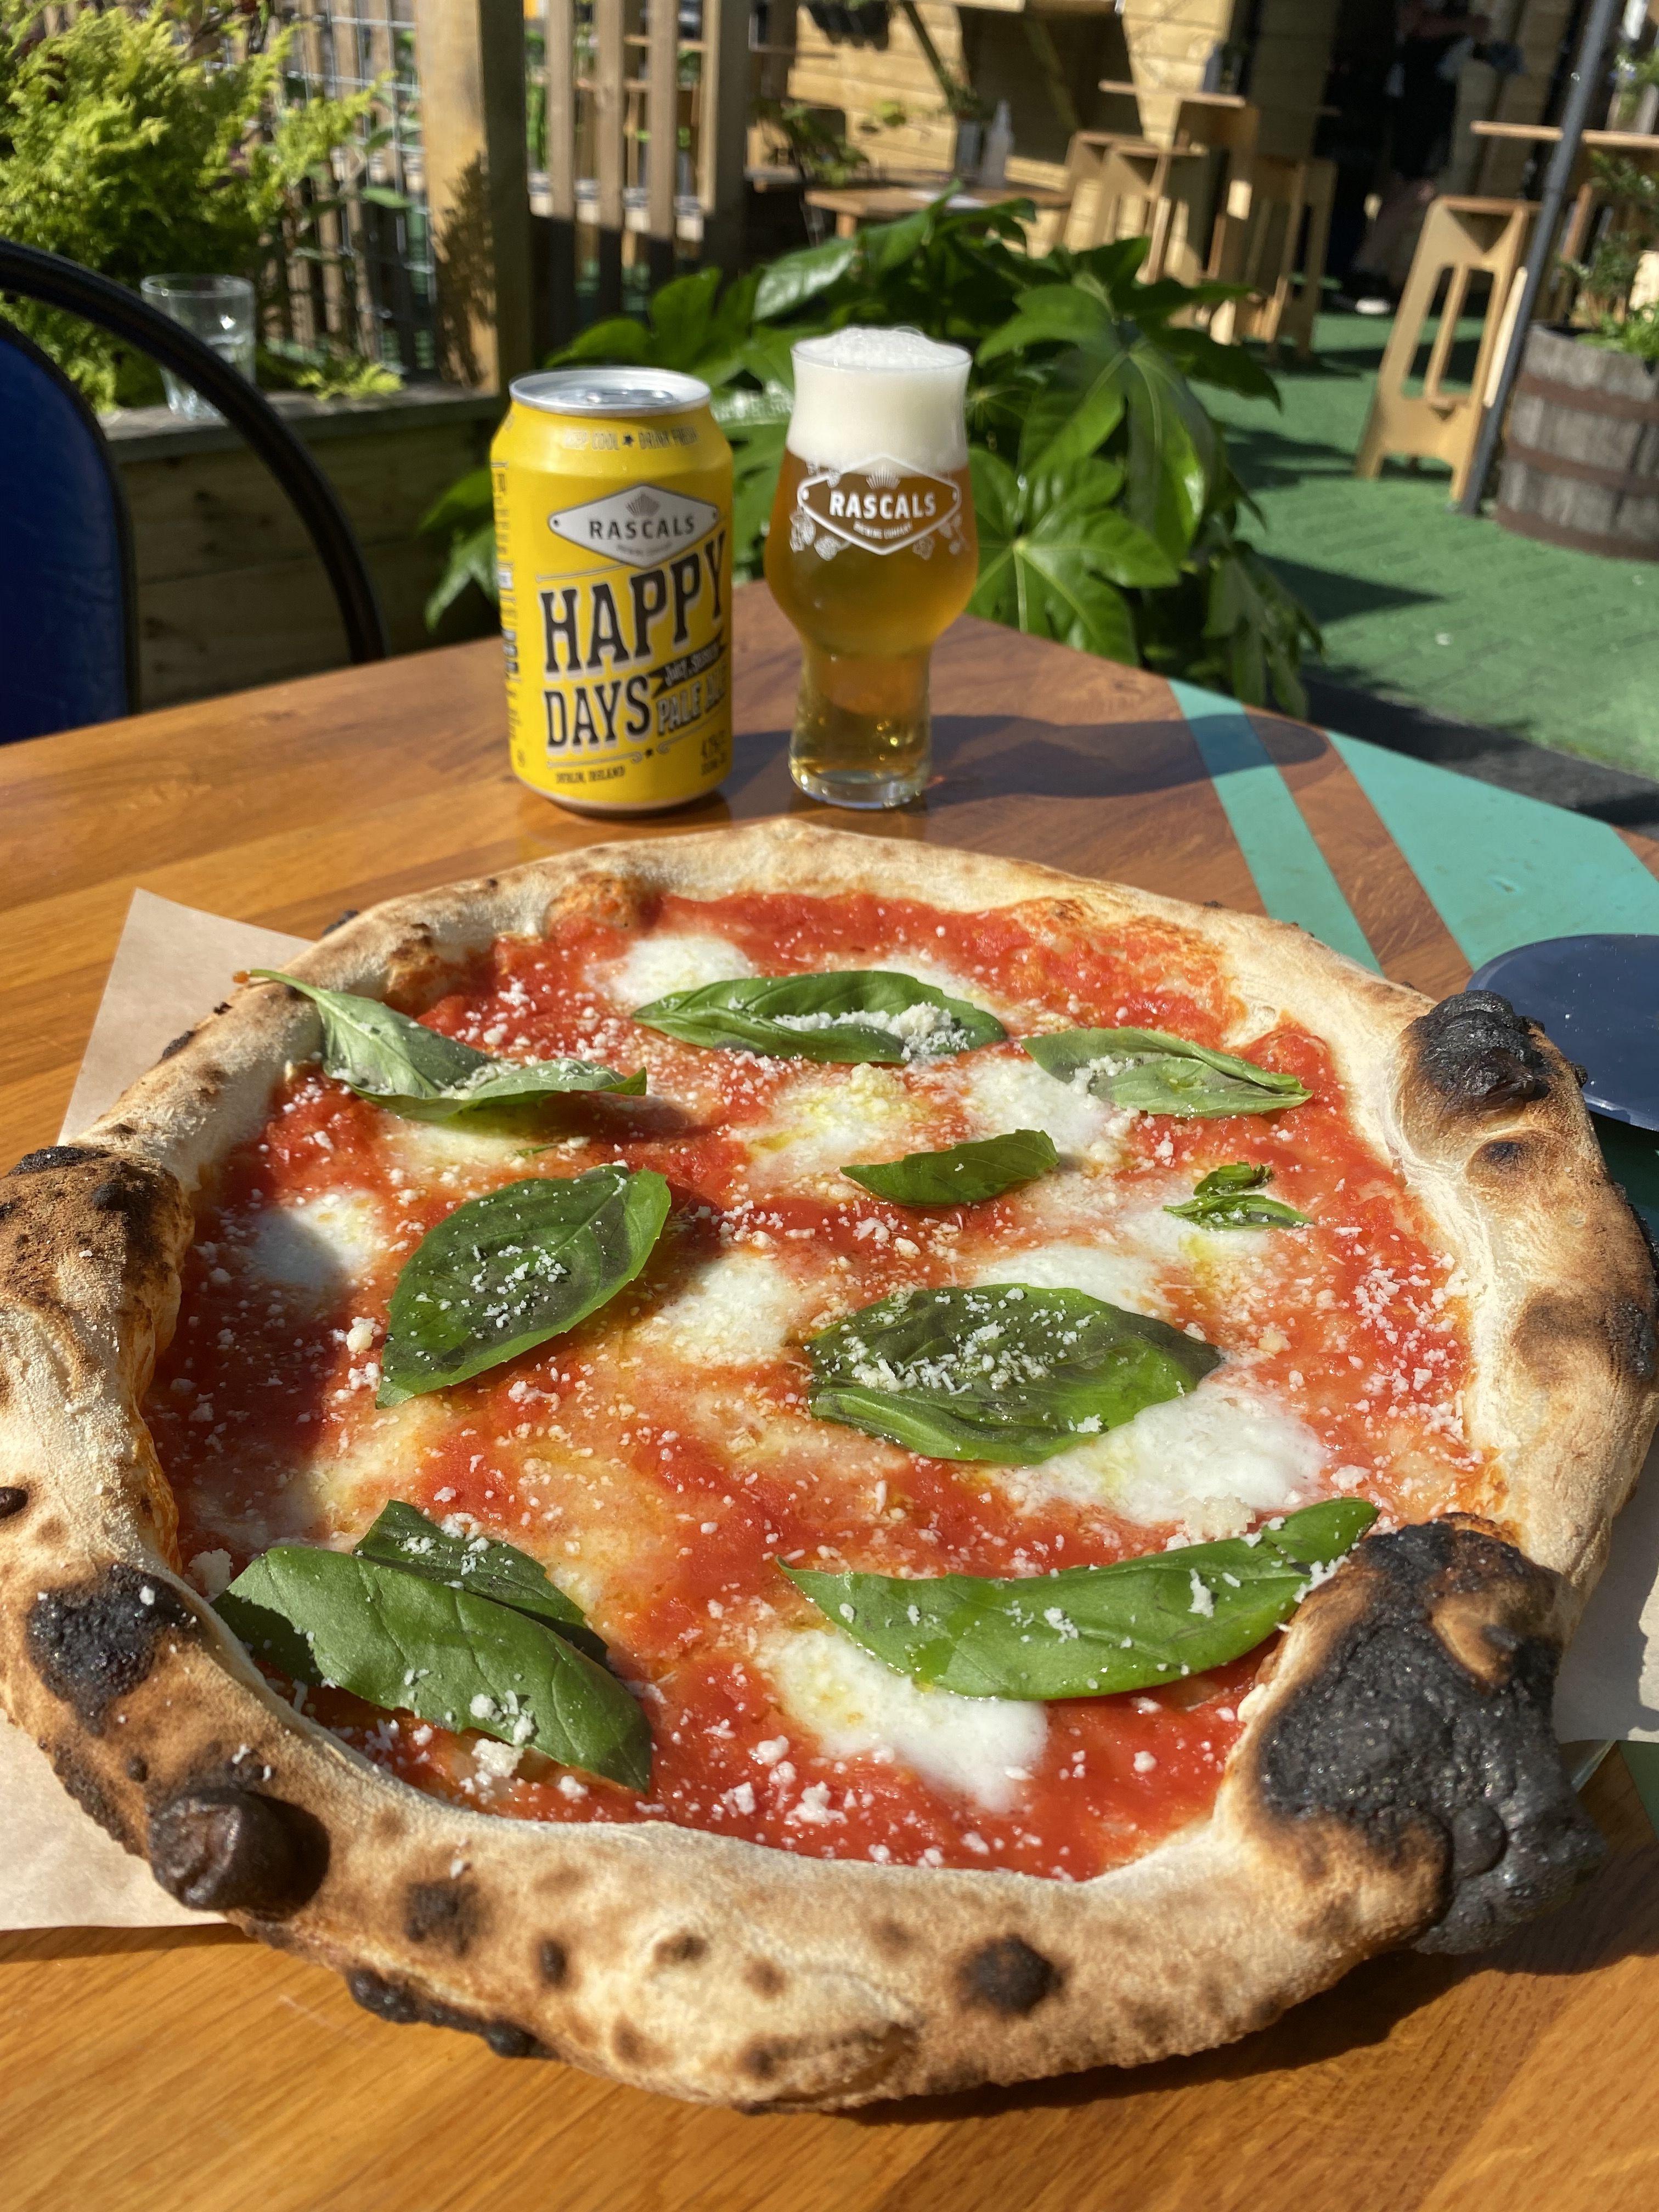 The Buffalo Saints pizza with Happy Days